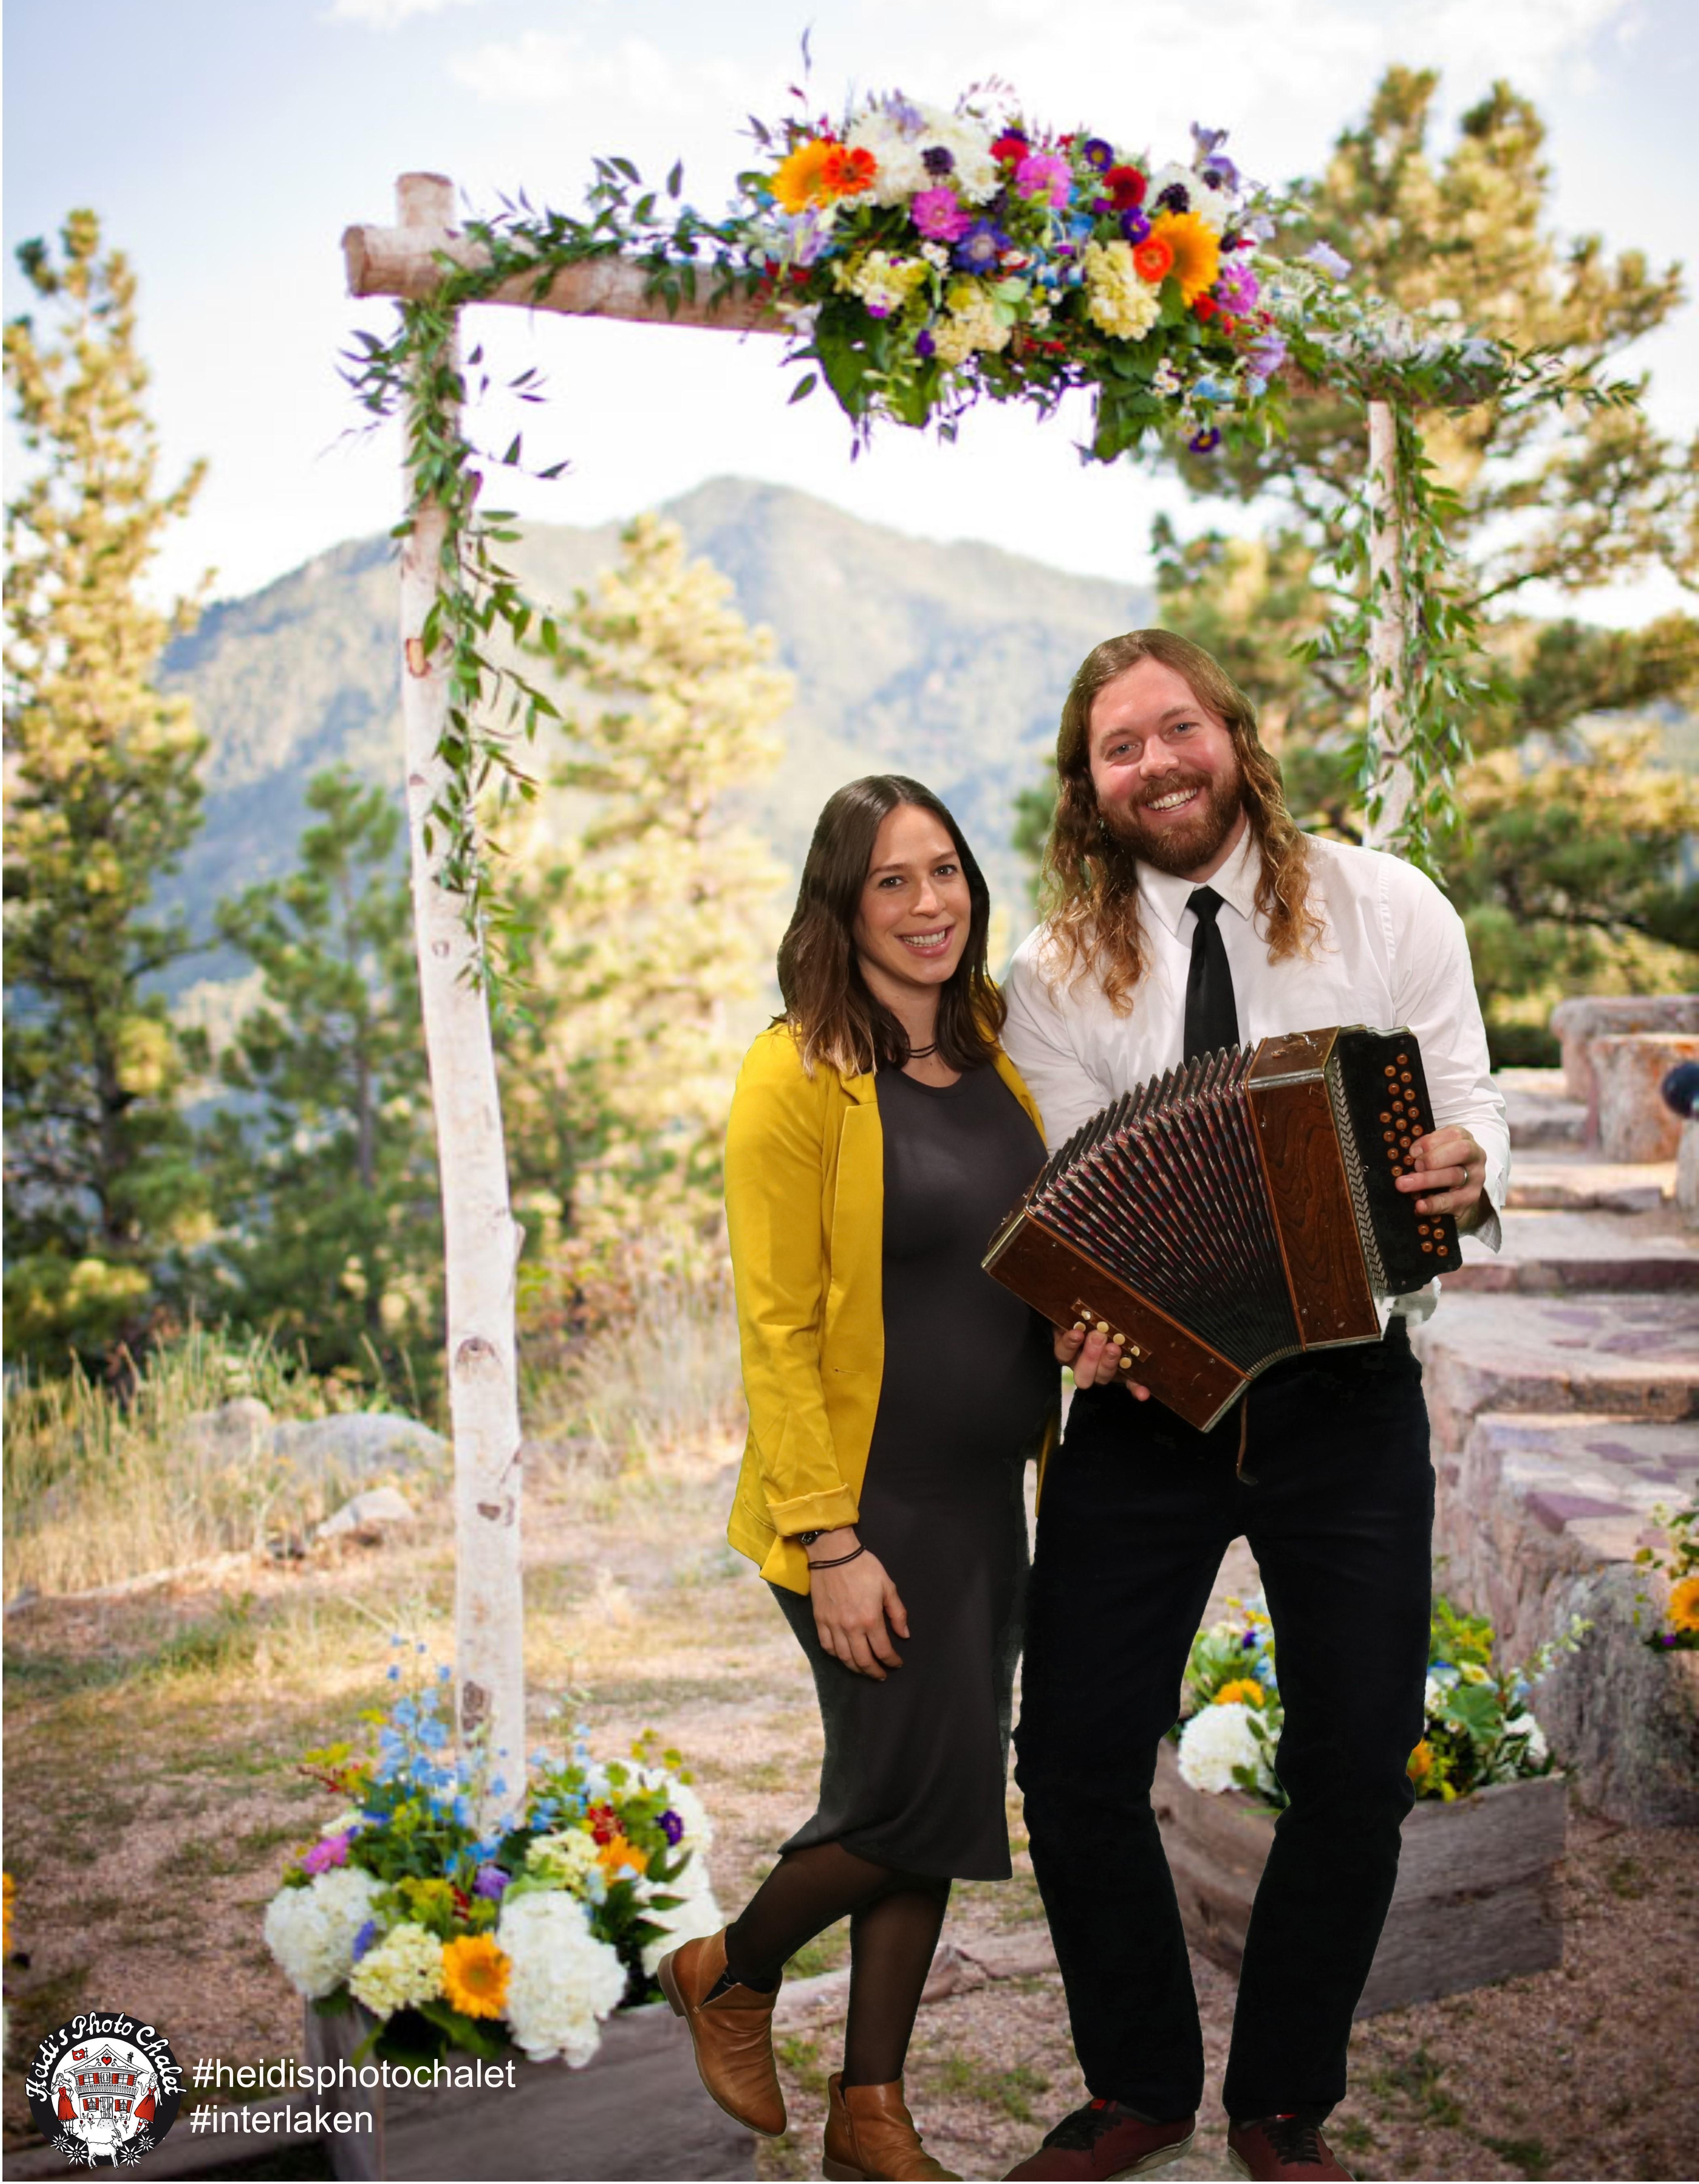 Hochzeits-Apéro Heidi's Photo Chalet